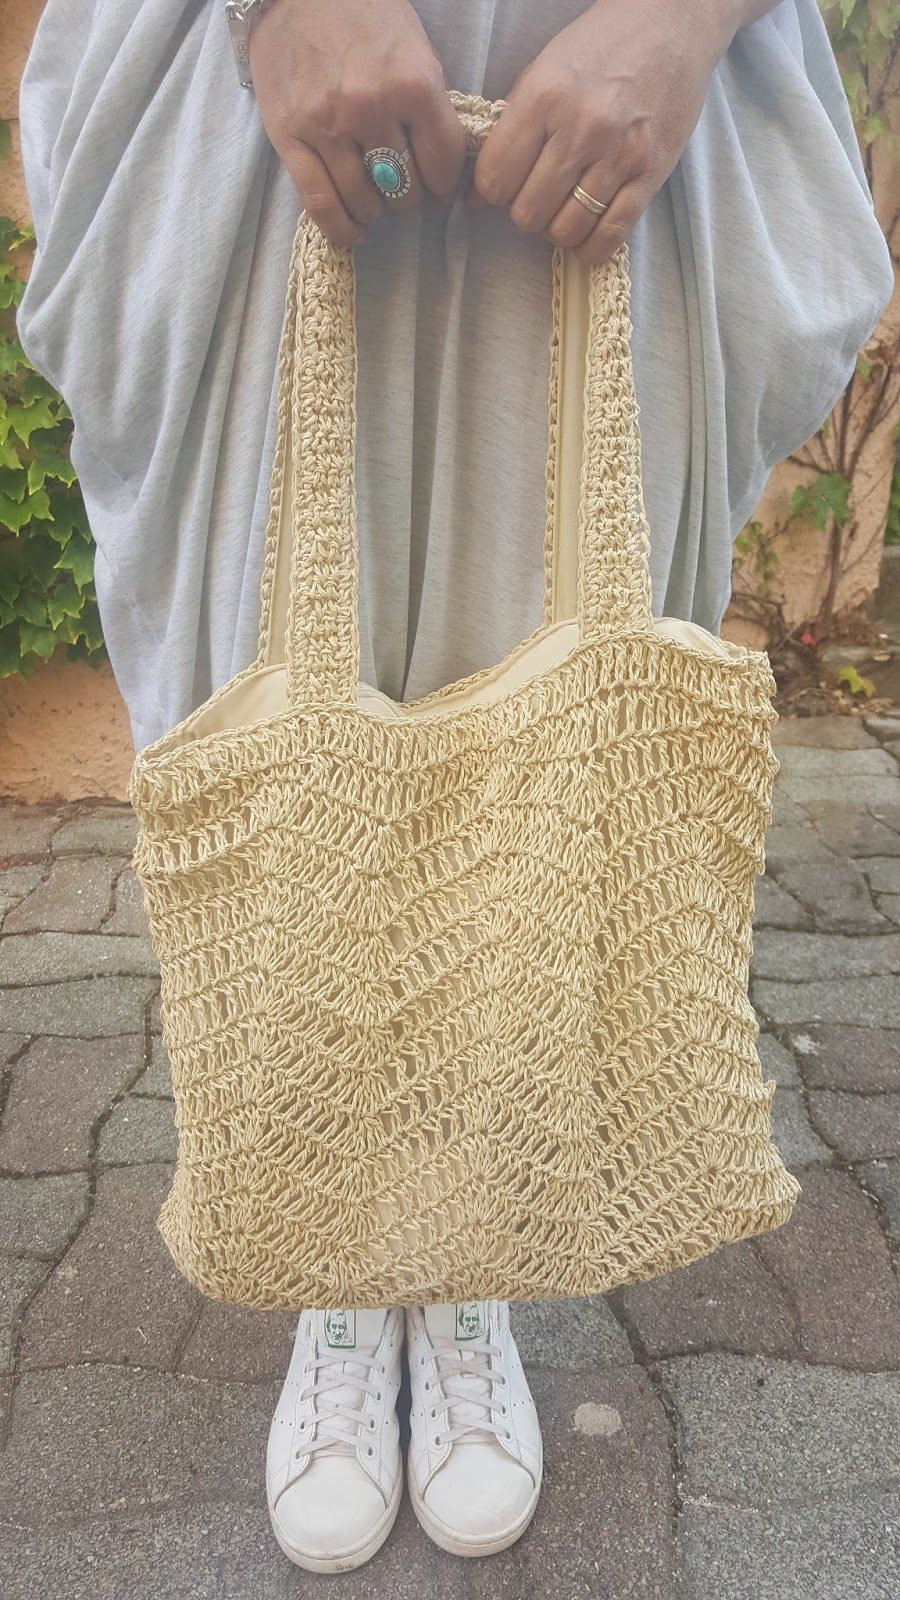 http://chantier.allee-du-foulard.fr/wp-content/uploads/2017/09/Siennalou-sac-pizco-Allee-du-foulard-2-900x1600.jpg